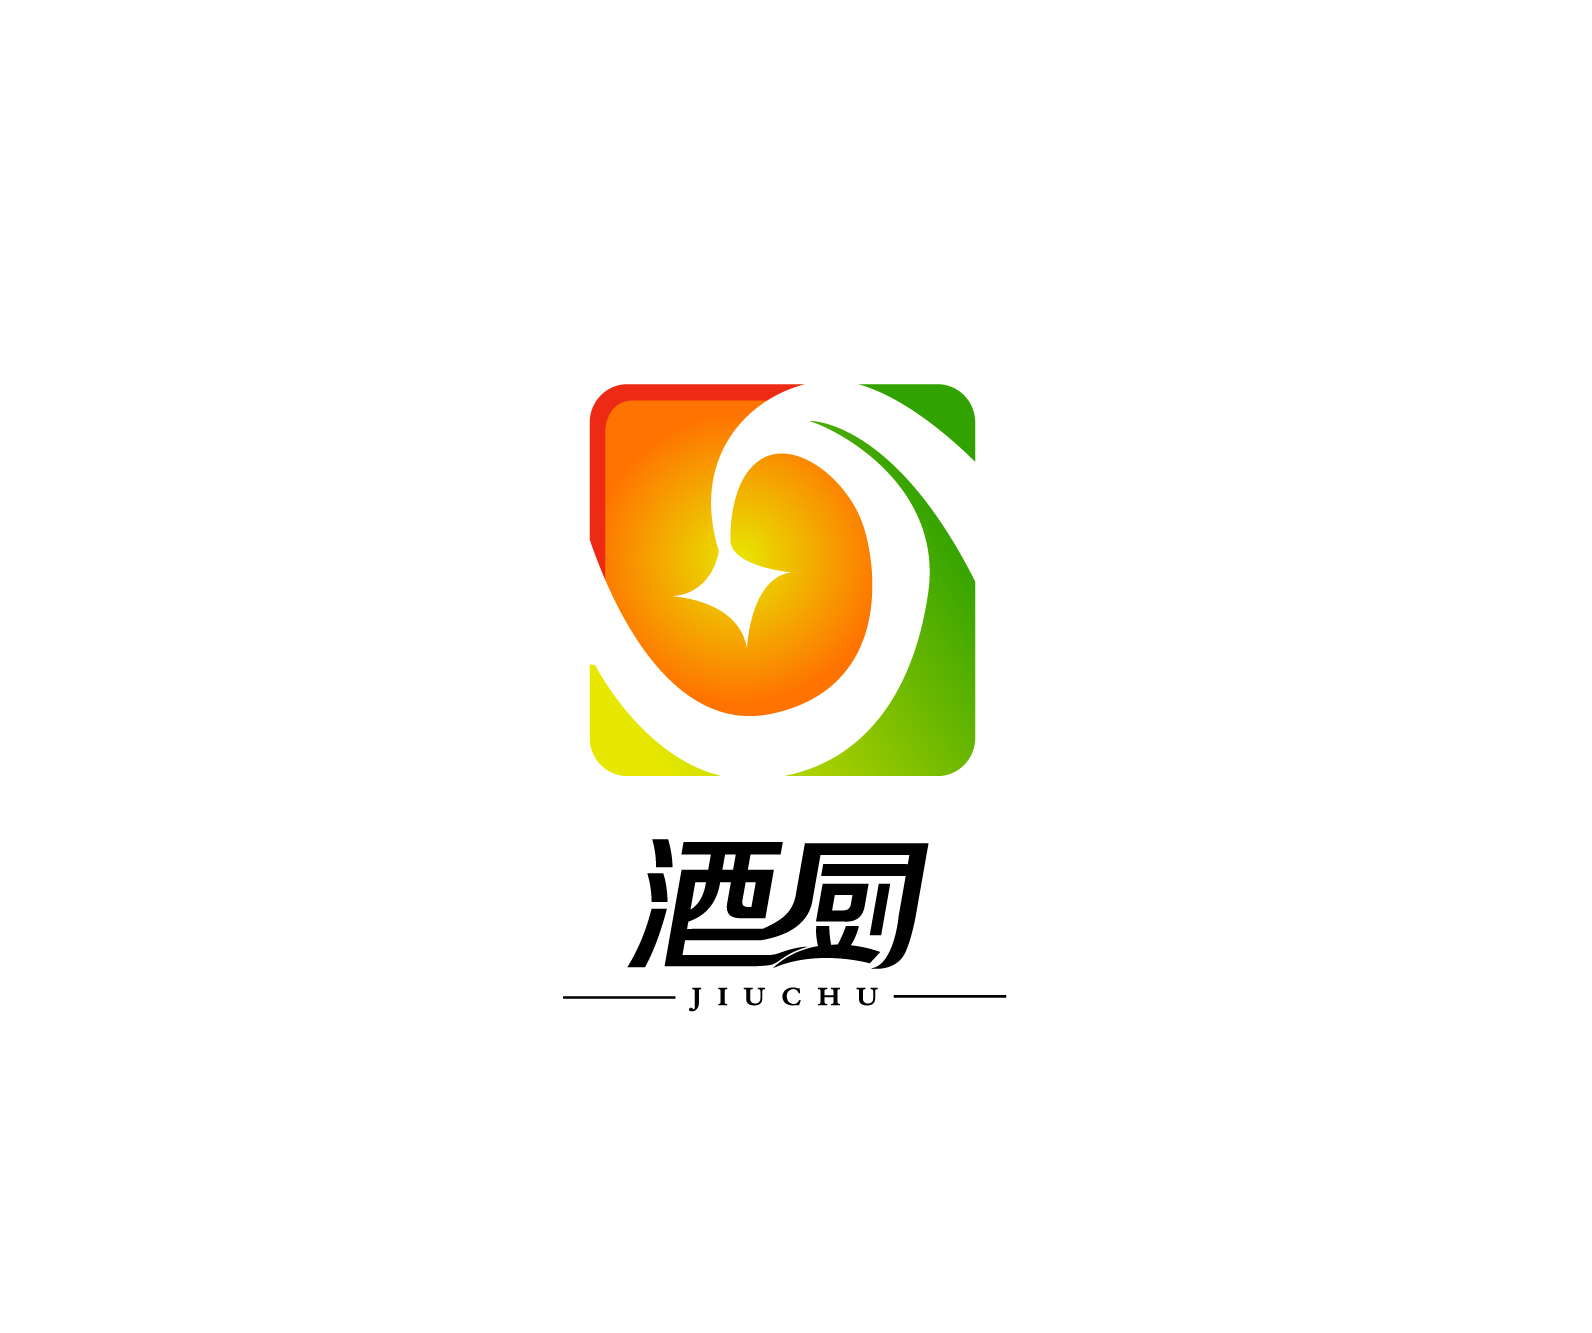 酒厨logo